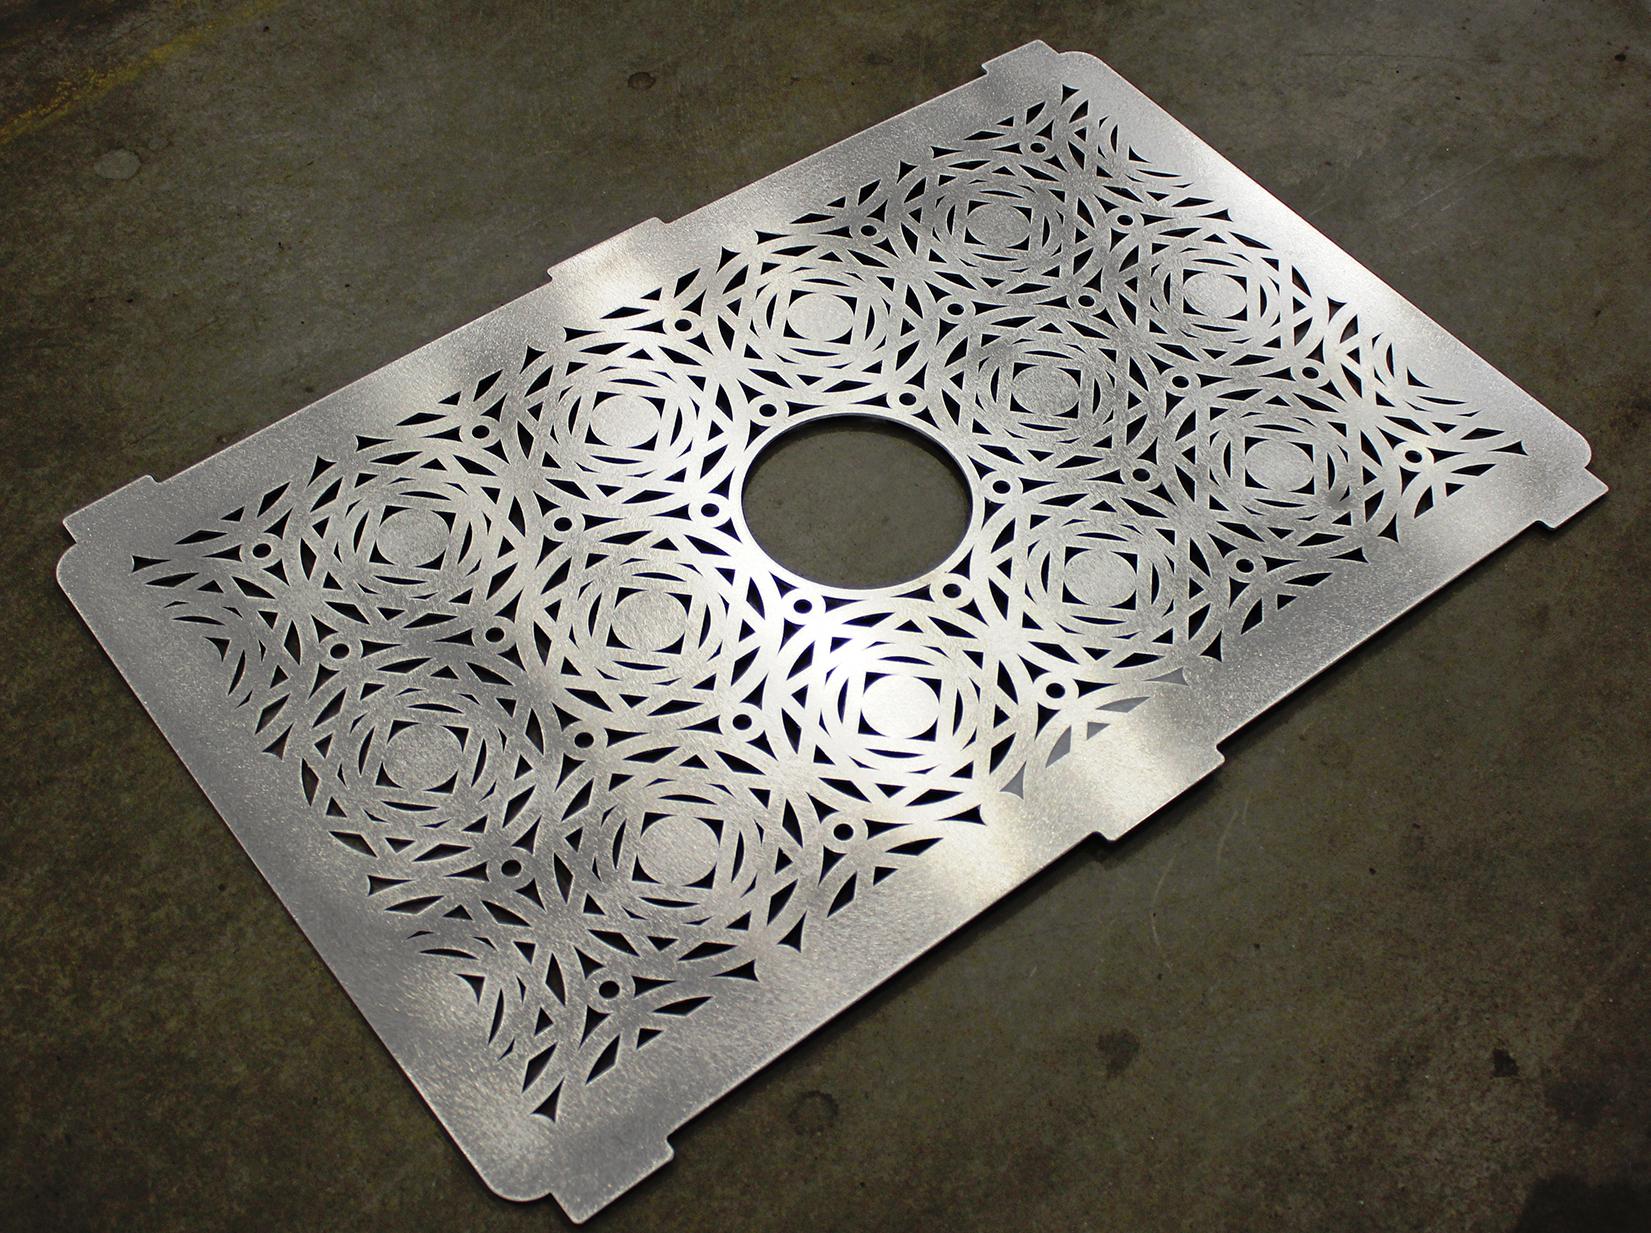 Laser Cut Panel Designed